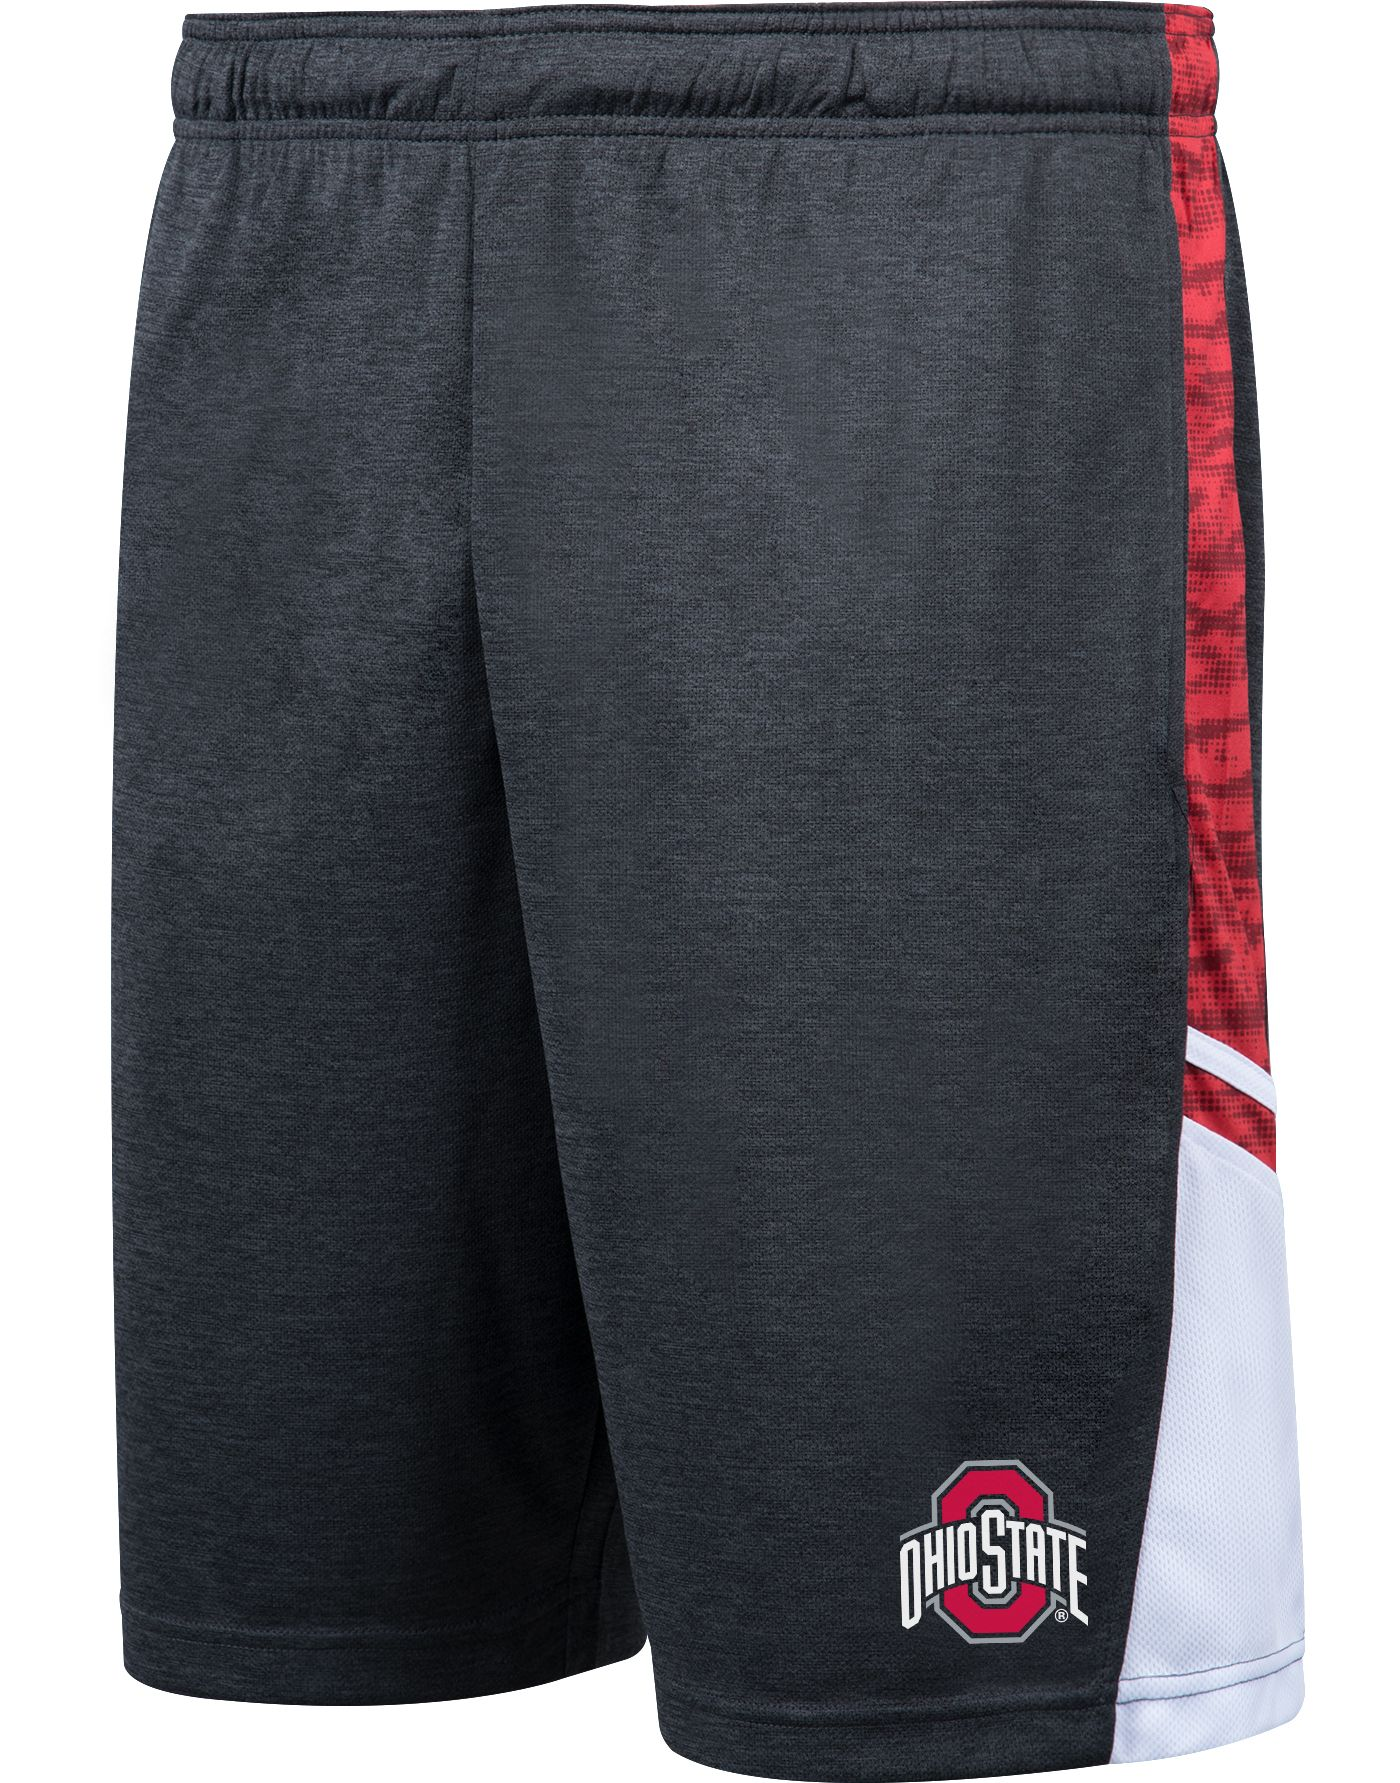 Scarlet & Gray Men's Ohio State Buckeyes Gray Panel Shorts